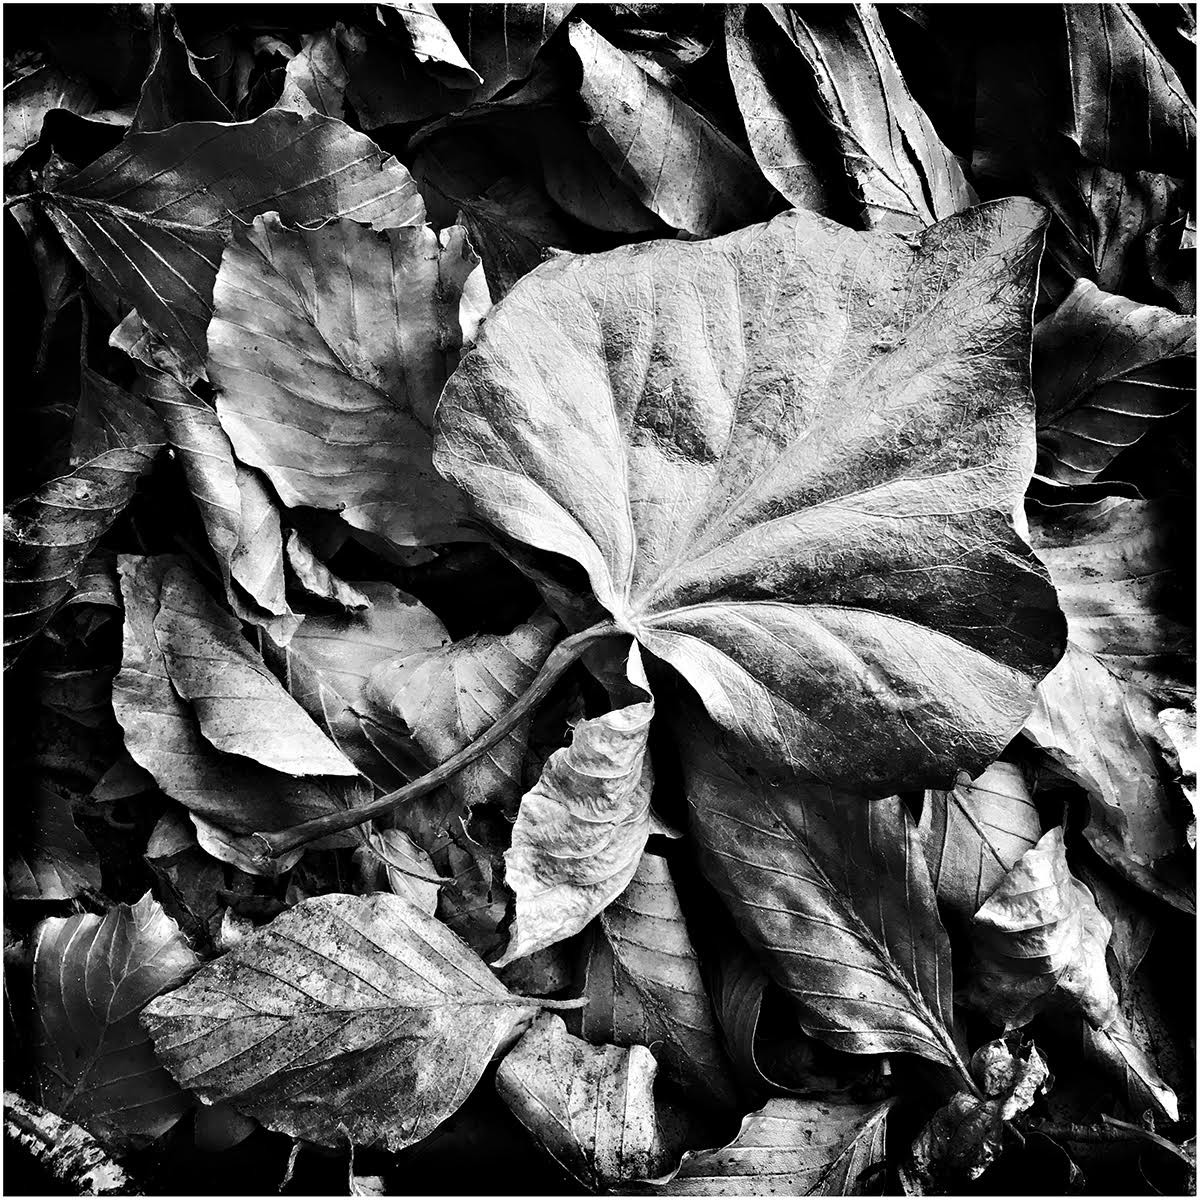 PDI - Fallen Leaf by Anita Kirkpatrick (8 marks)